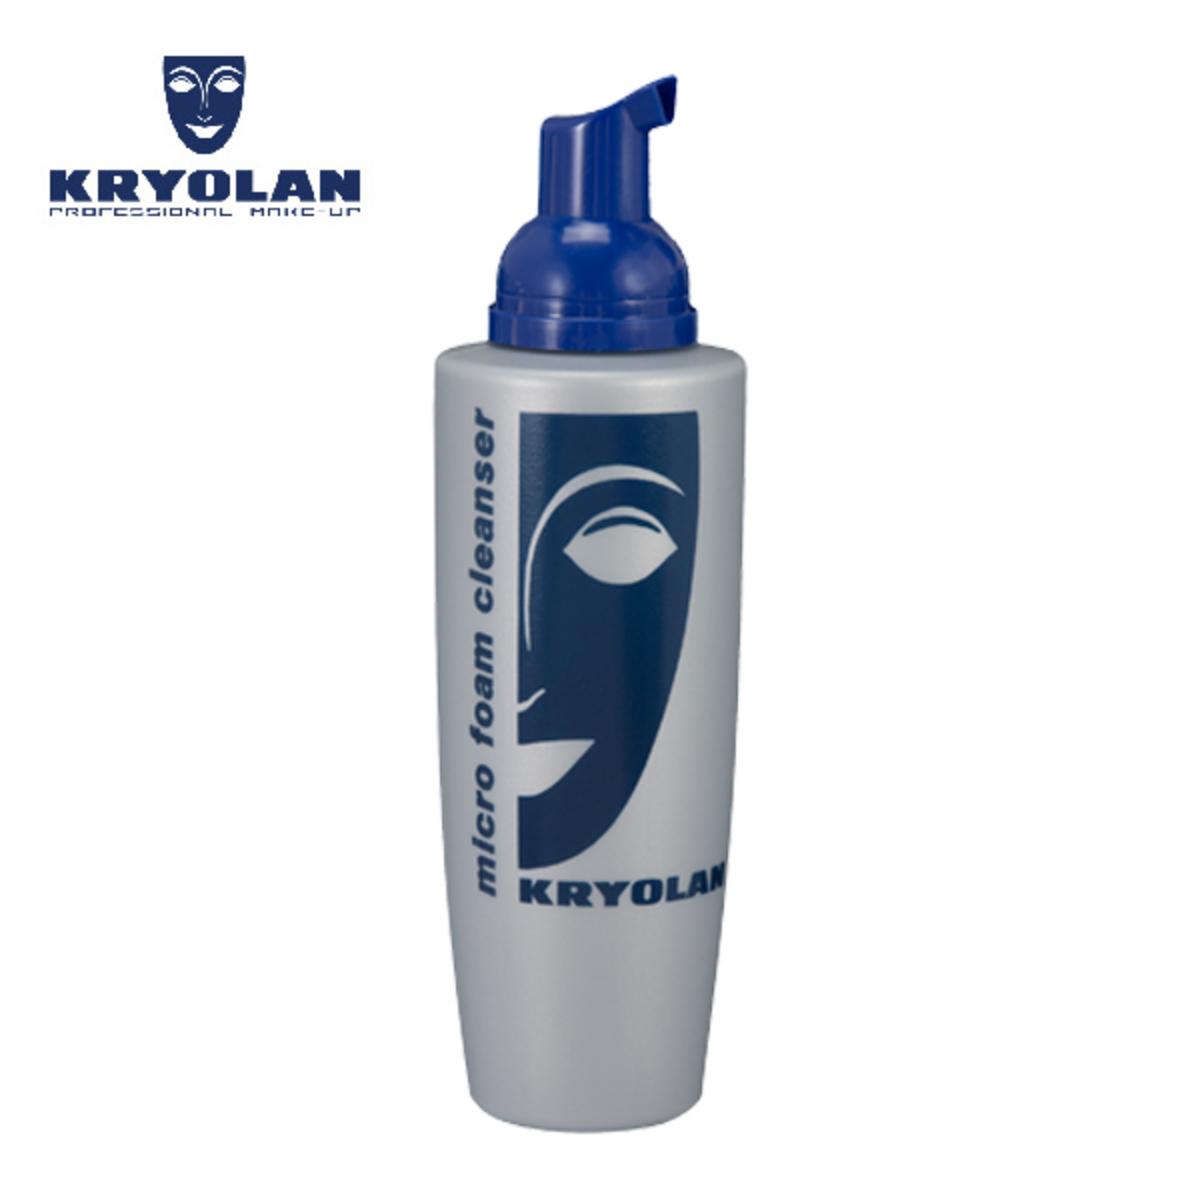 HD Micro Foam Cleanser 180ml - (Authorised Goods)